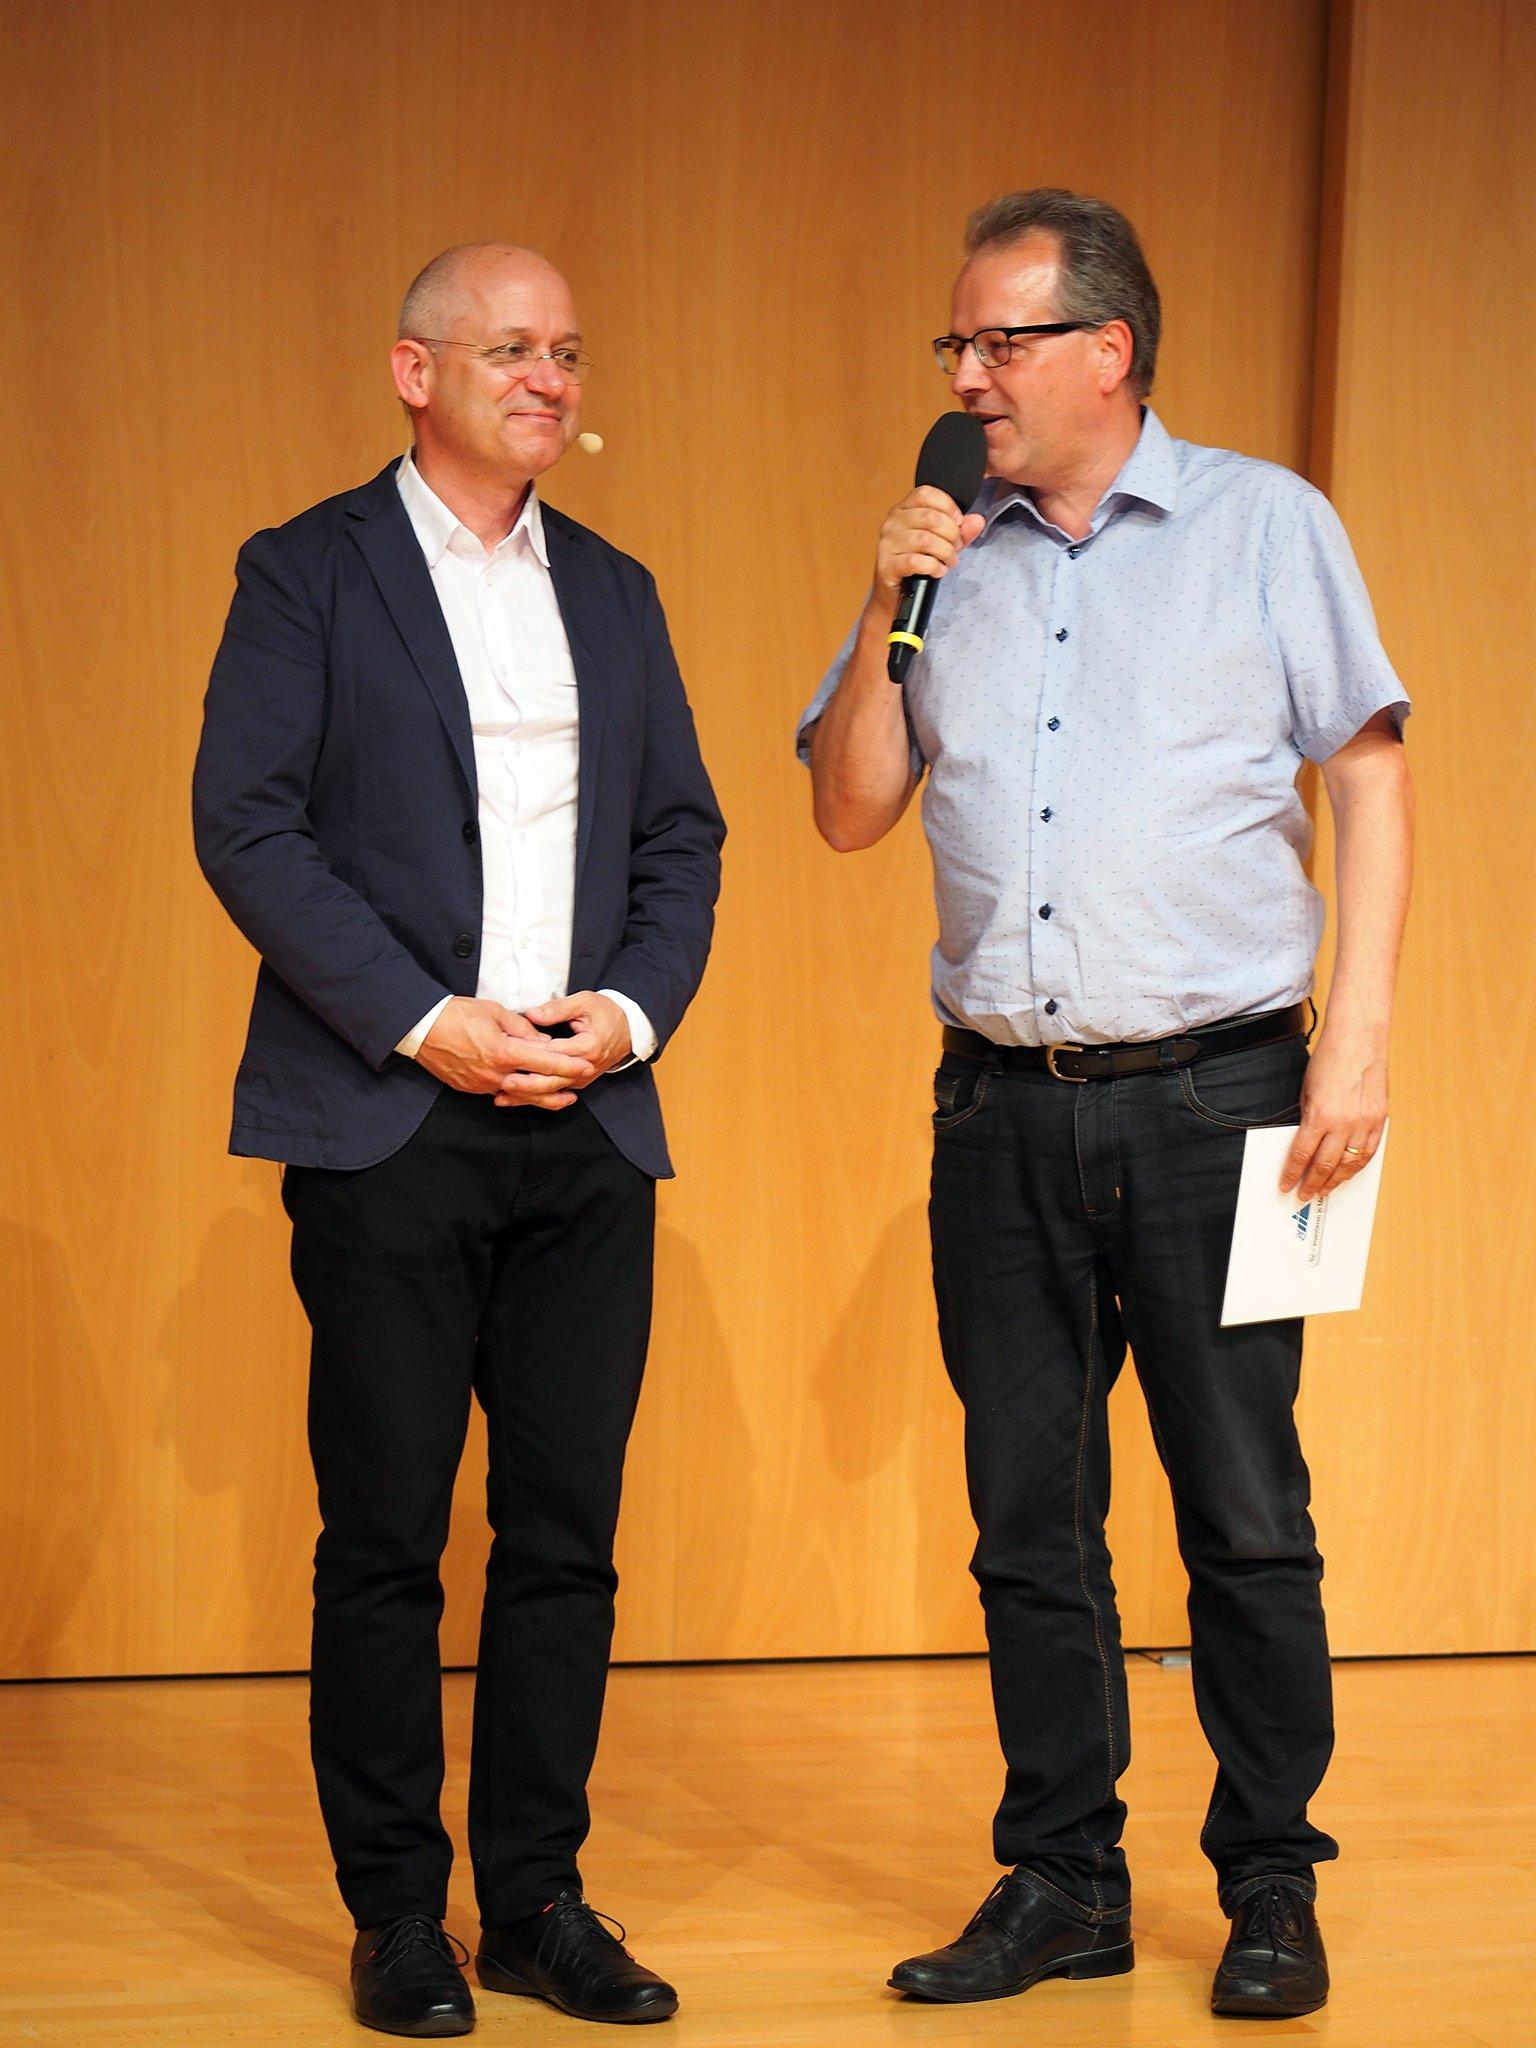 Pfarrer Heiner Schubert und Dr. Benedikt Walker (Rektor tsc)